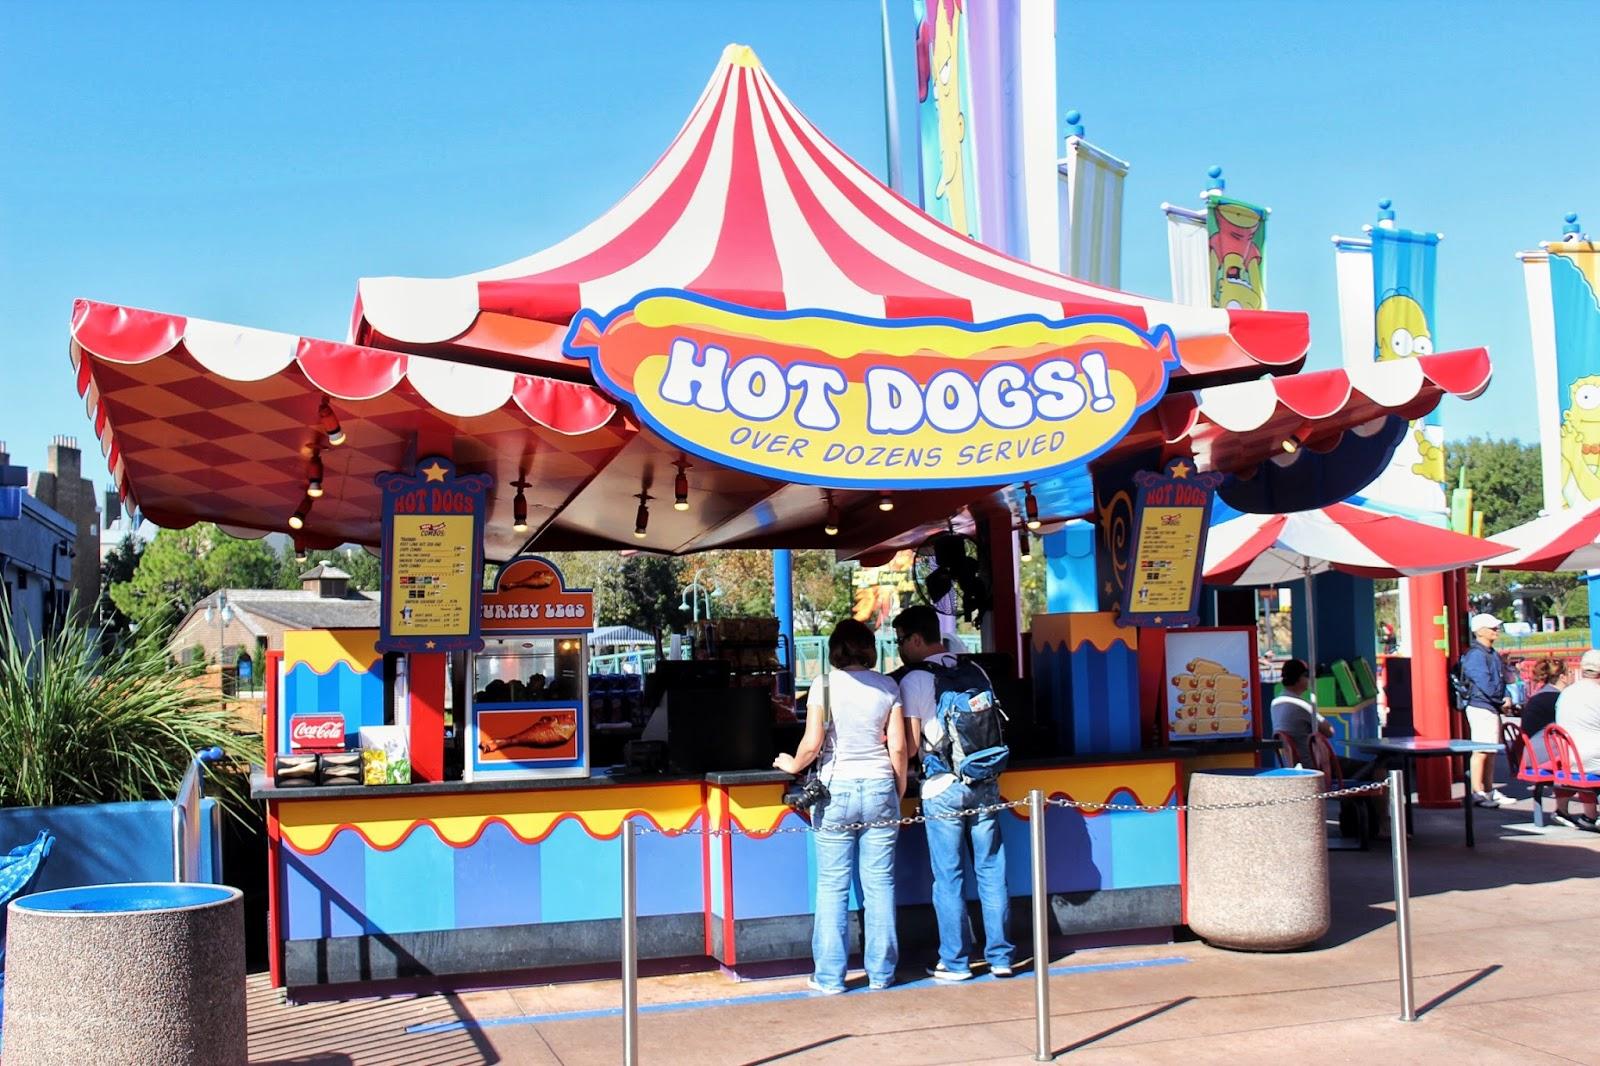 lifesthayle-springfield-universal-hot-dogs.JPG